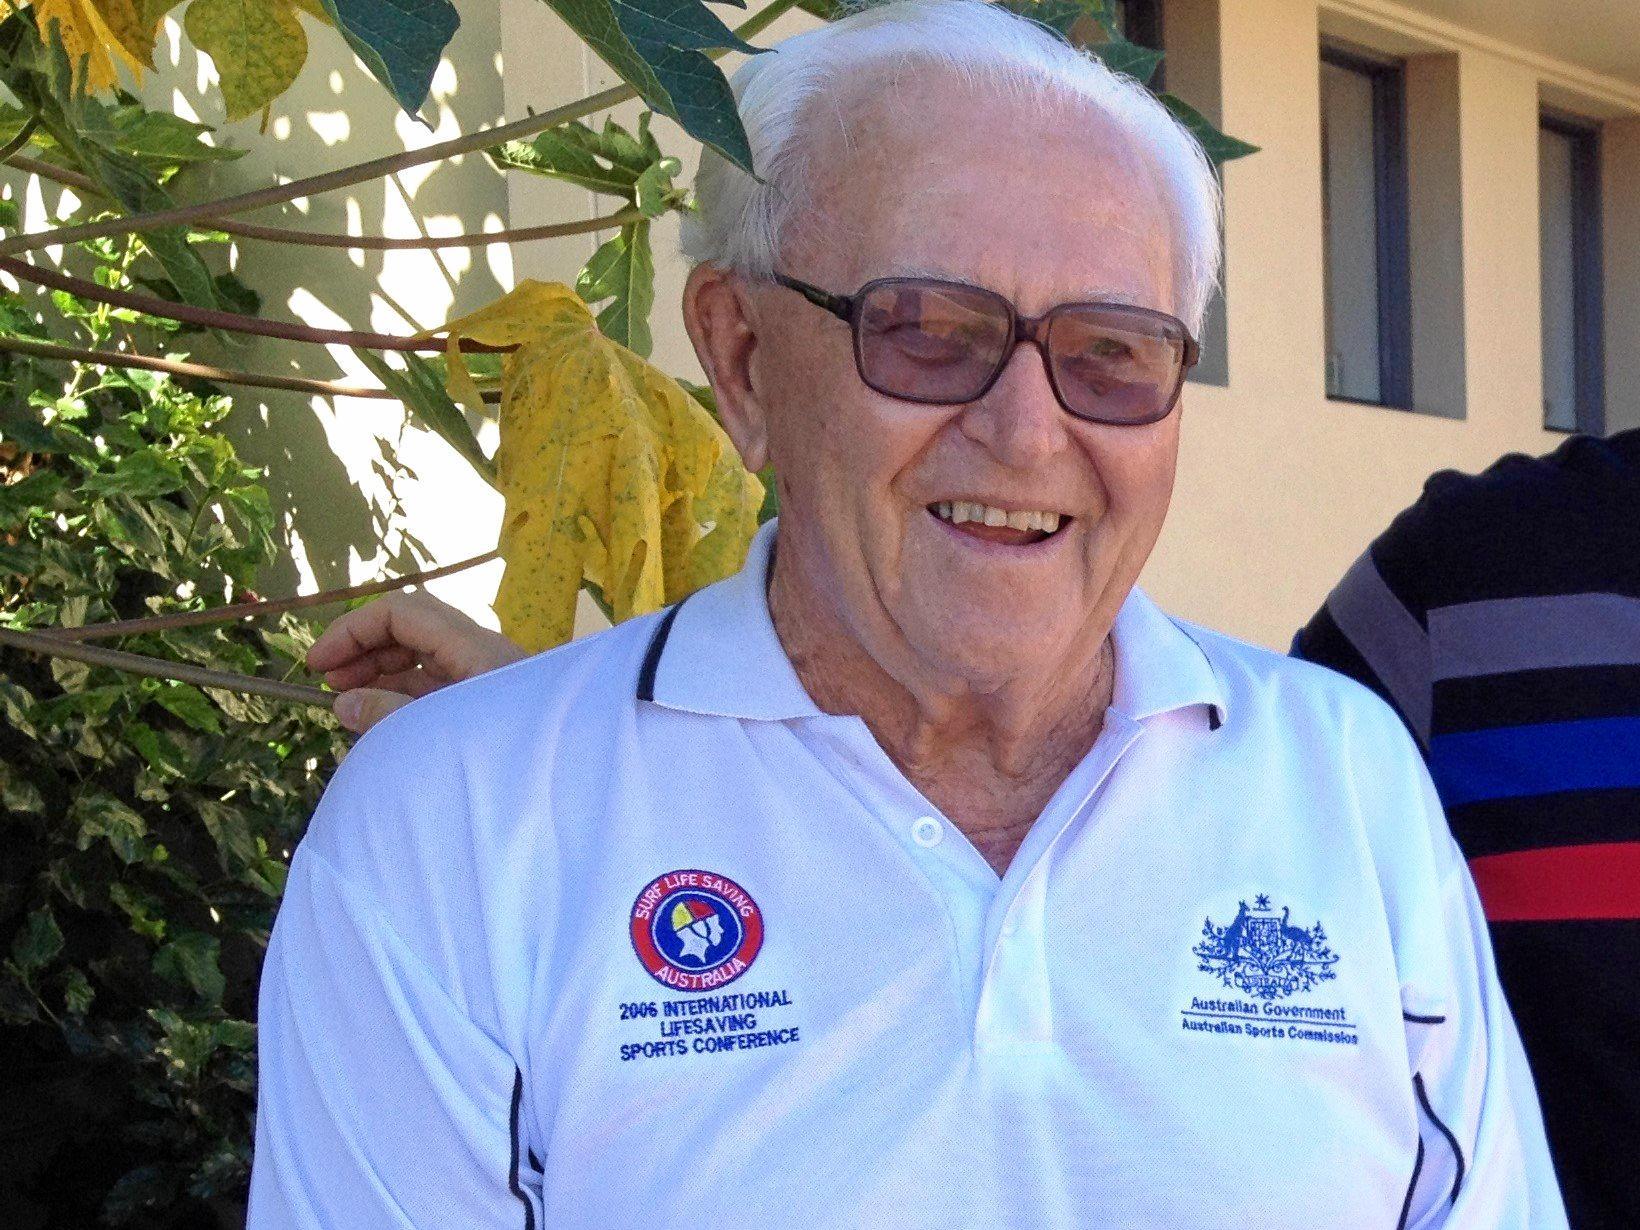 Beloved Surf Life Saving NSW life member, Gordon McNaughton, passed away on October 21 at the age of 93.